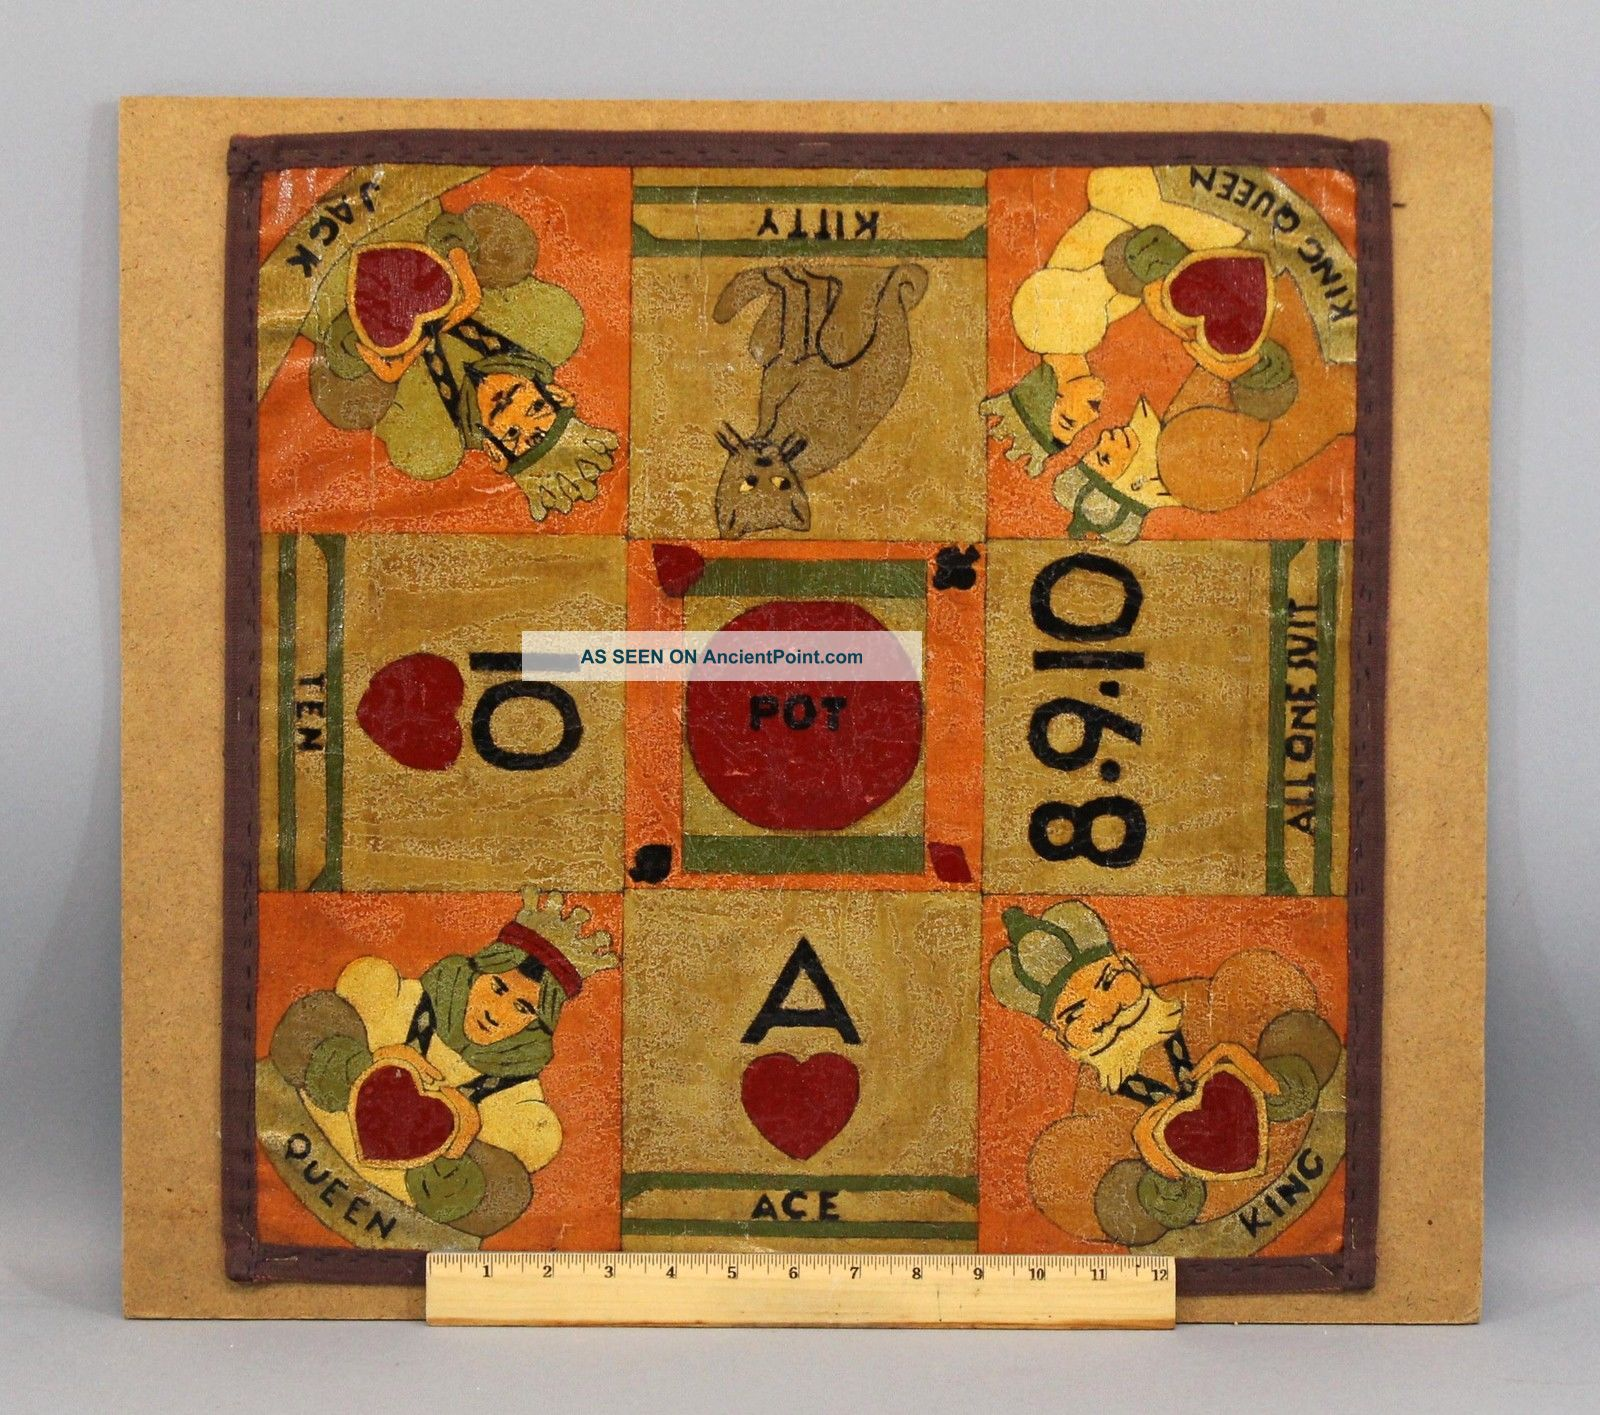 Antique Circa 1920s Folk Art Painting Canvas Card Game Sailors Gameboard,  Nr Folk Art photo